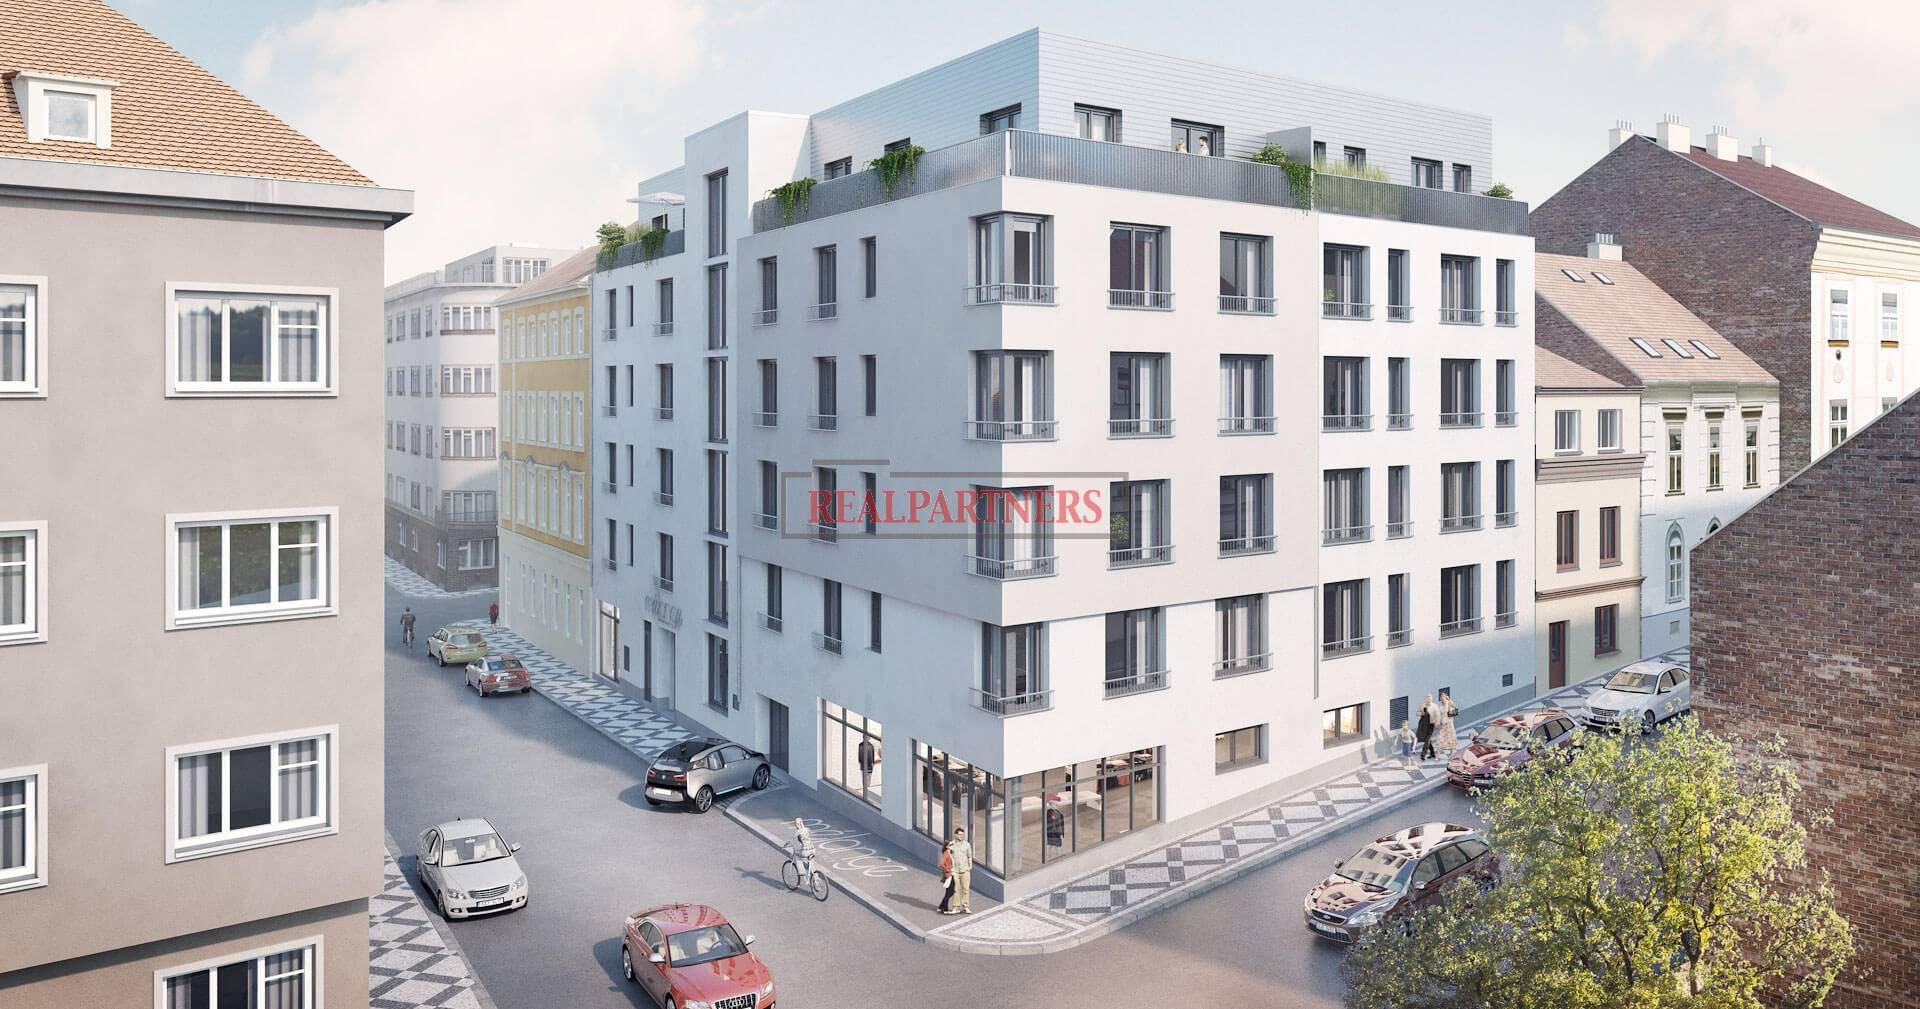 Nový byt 2+kk o ploše 52,52m² na rozhraní Smíchova a Radlic.